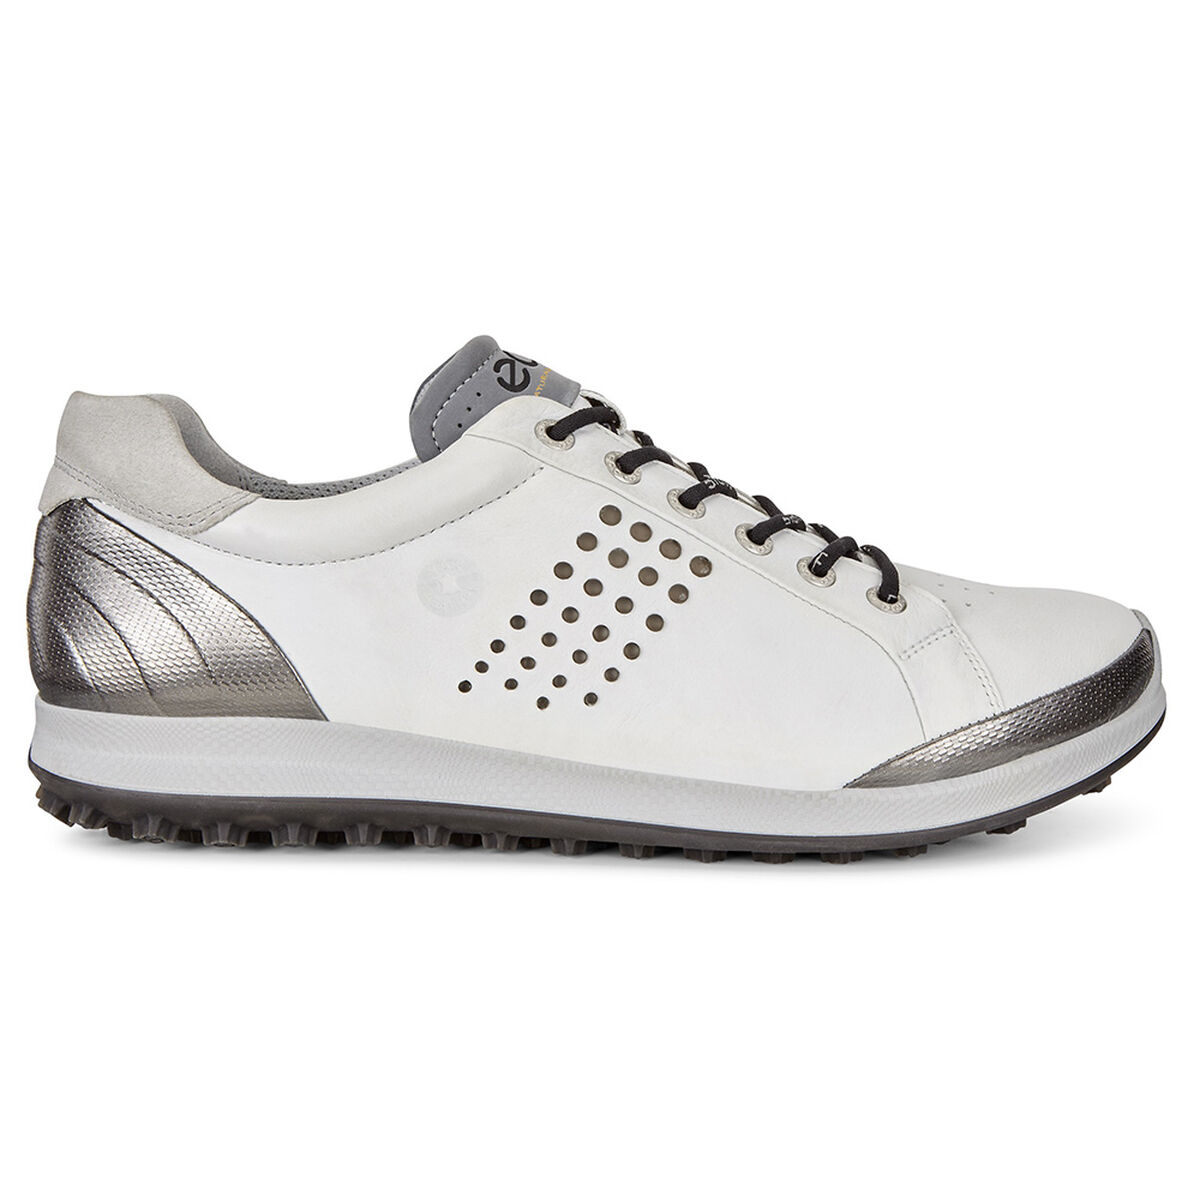 51dee94b78 BIOM Hybrid 2 Men's Golf Shoe - White/Black